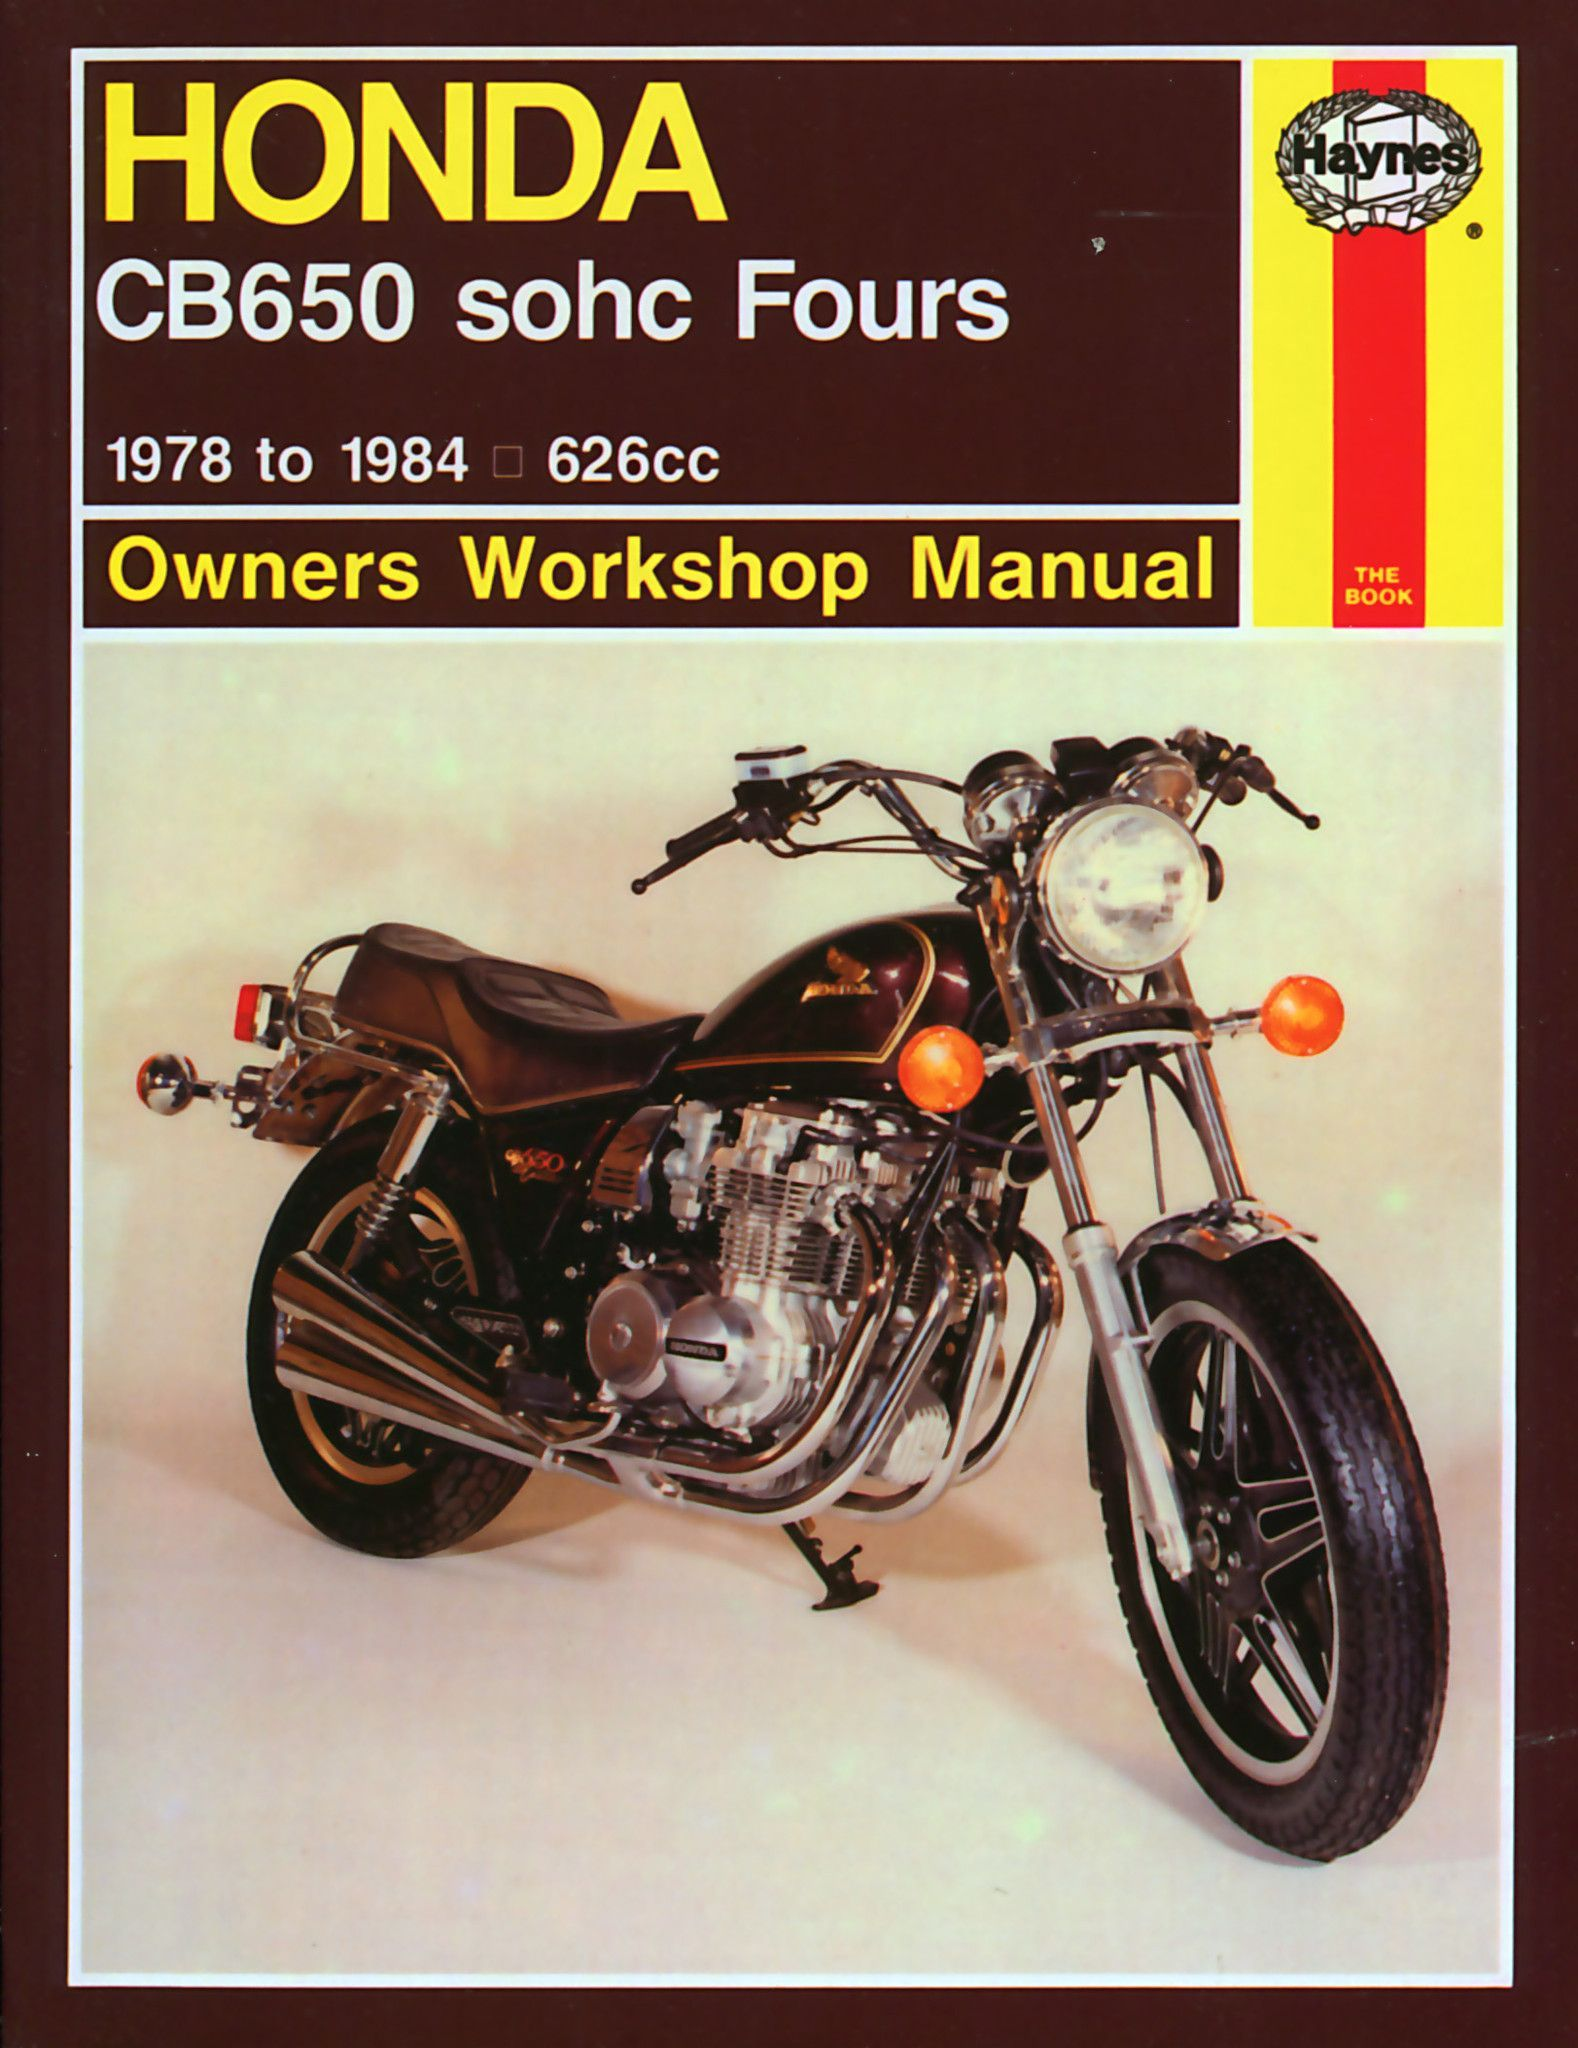 Haynes M665 Repair Manual for 1979-82 Honda CB650 sohc Fours 626cc